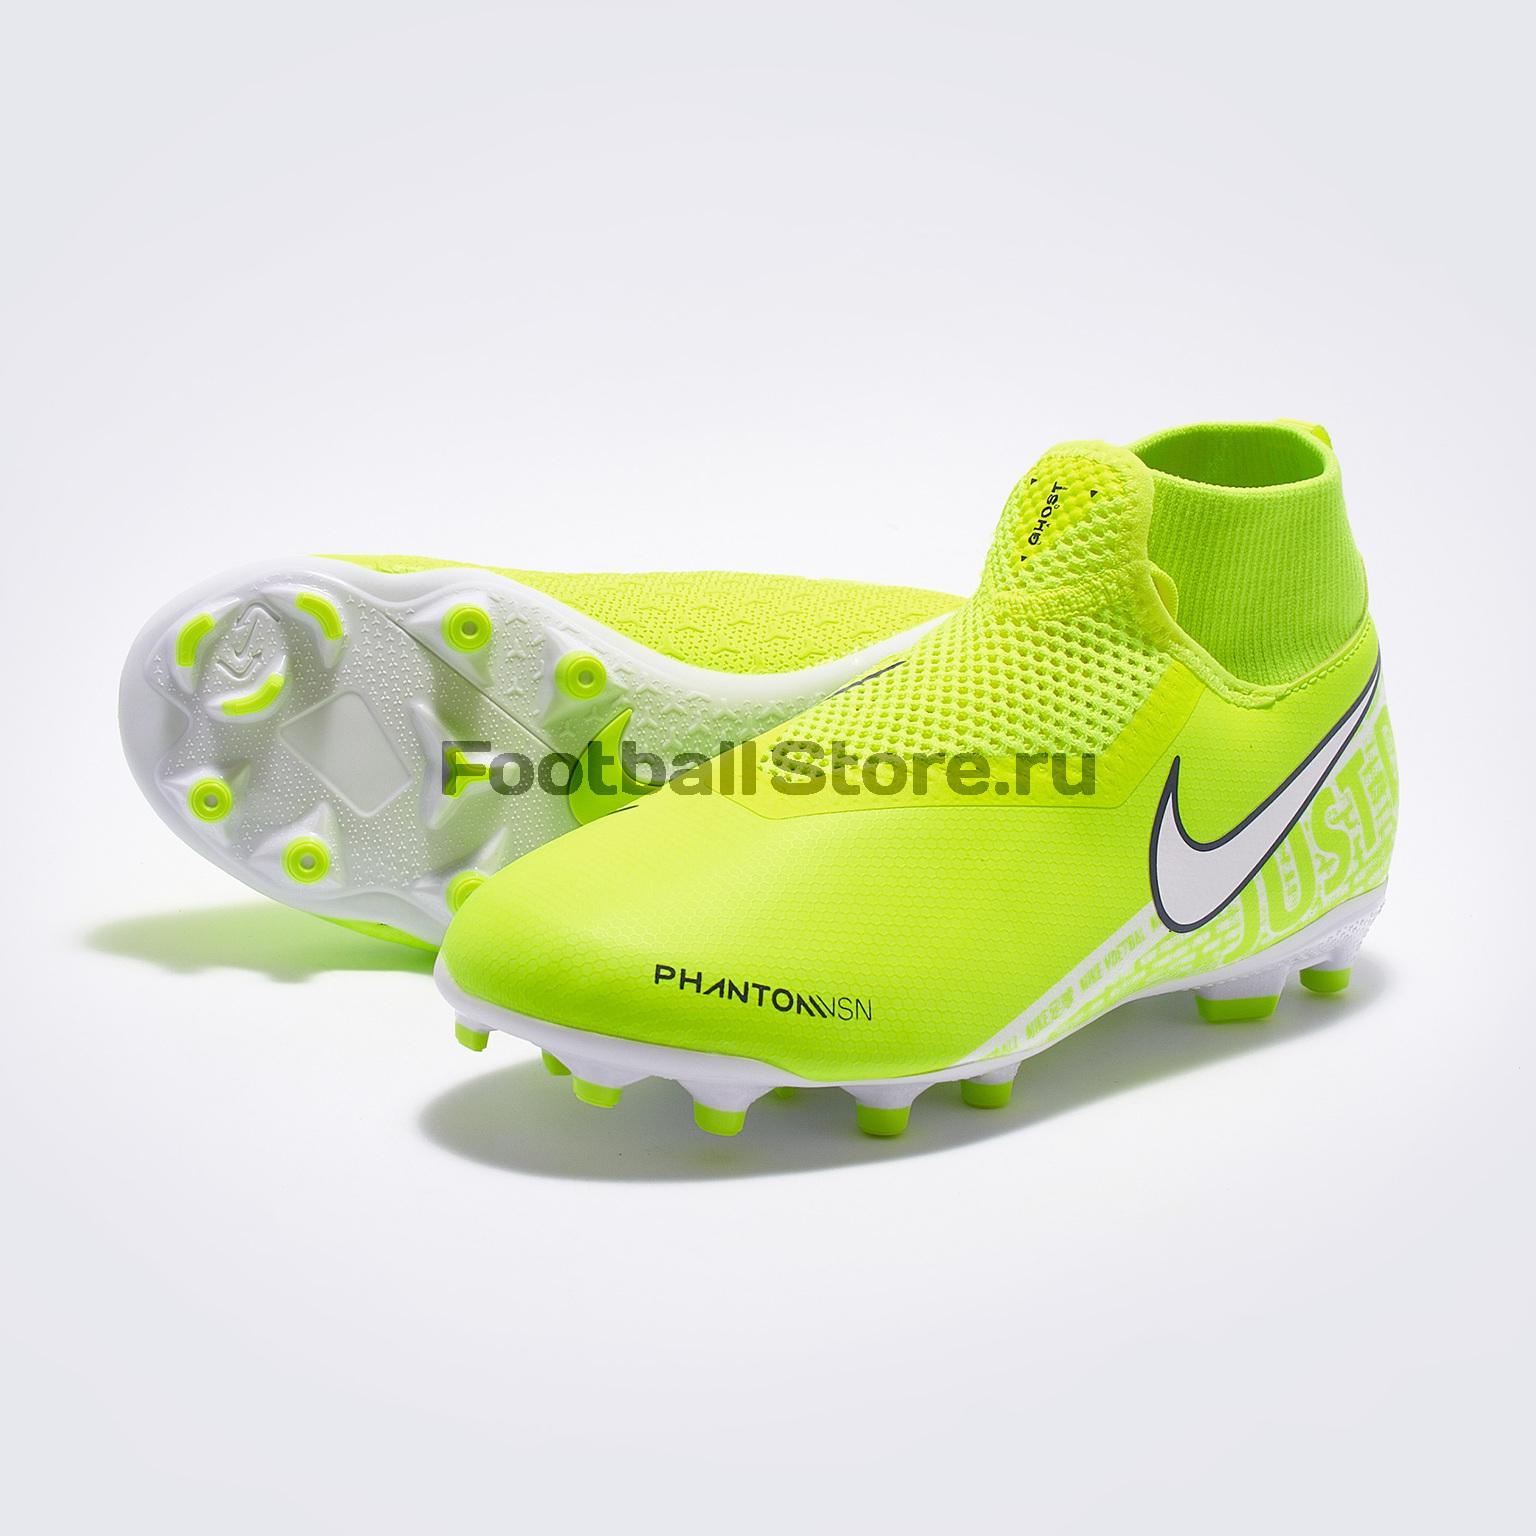 Бутсы детские Nike Phantom Vision Academy DF FG/MG AO3287-717 цена